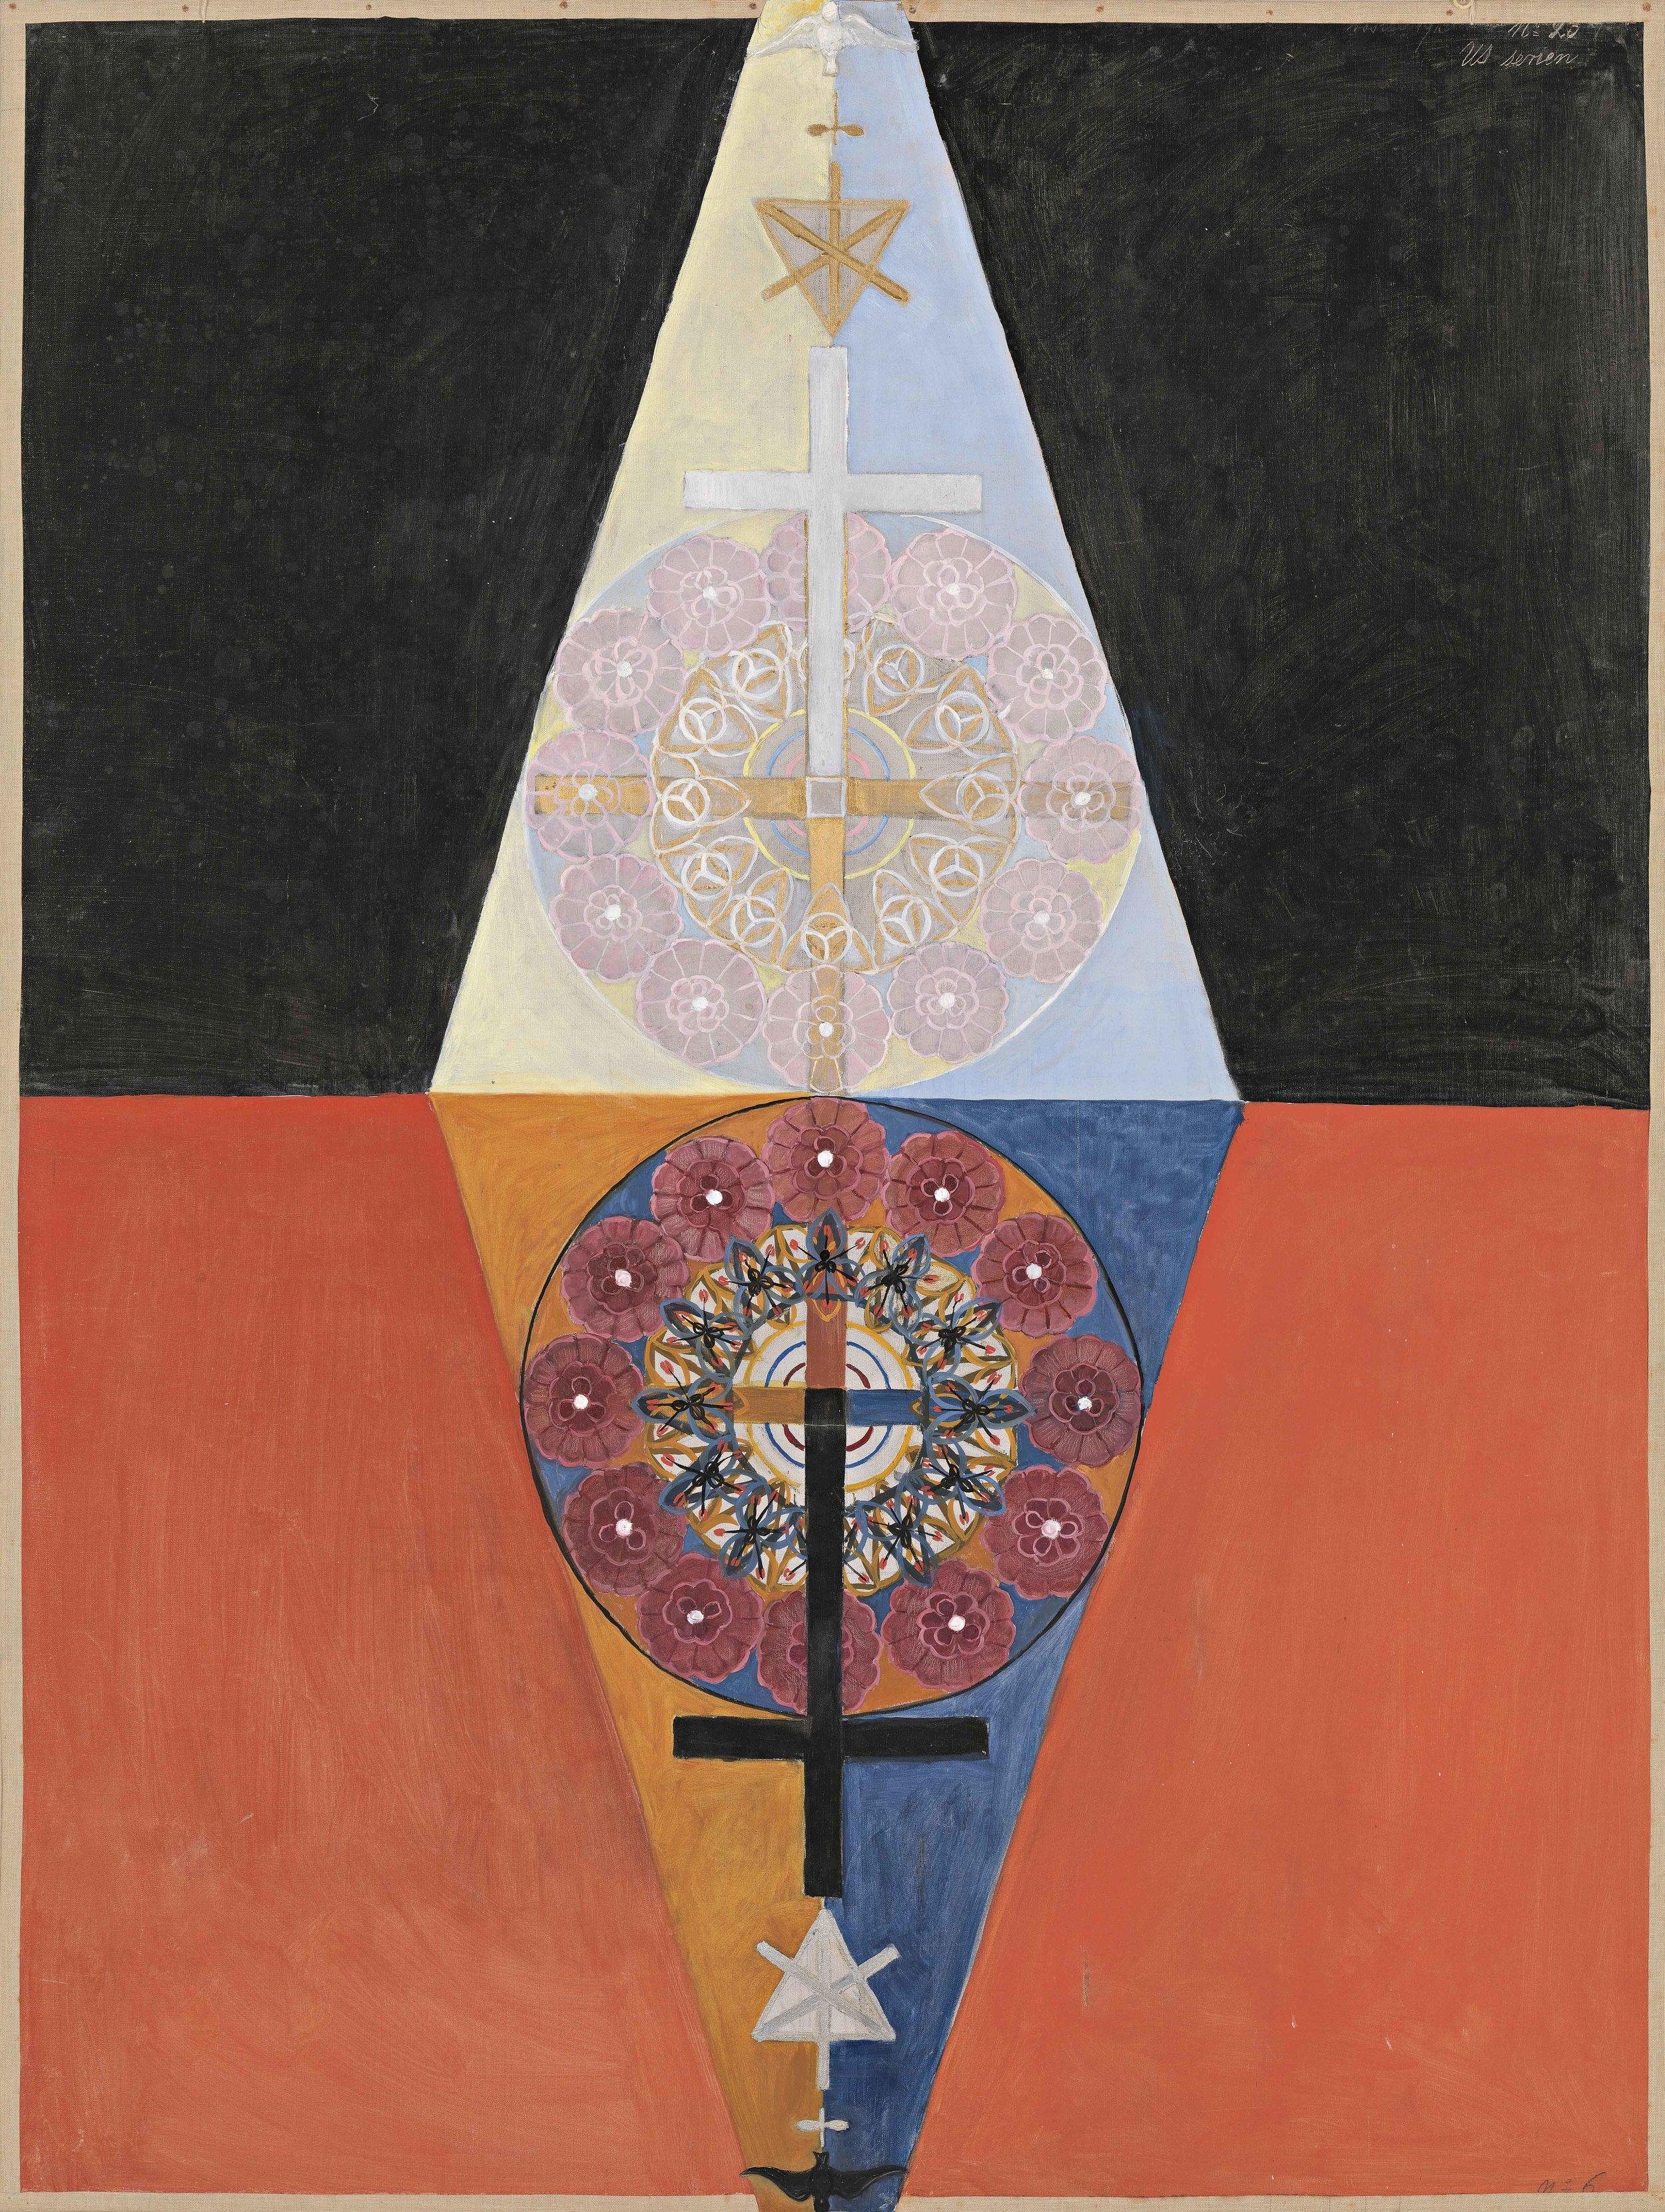 Hilma af Klint  Nr. 6, Series US, Grupp VIII  1913 Oil on canvas 152,5 x 115,5 cm